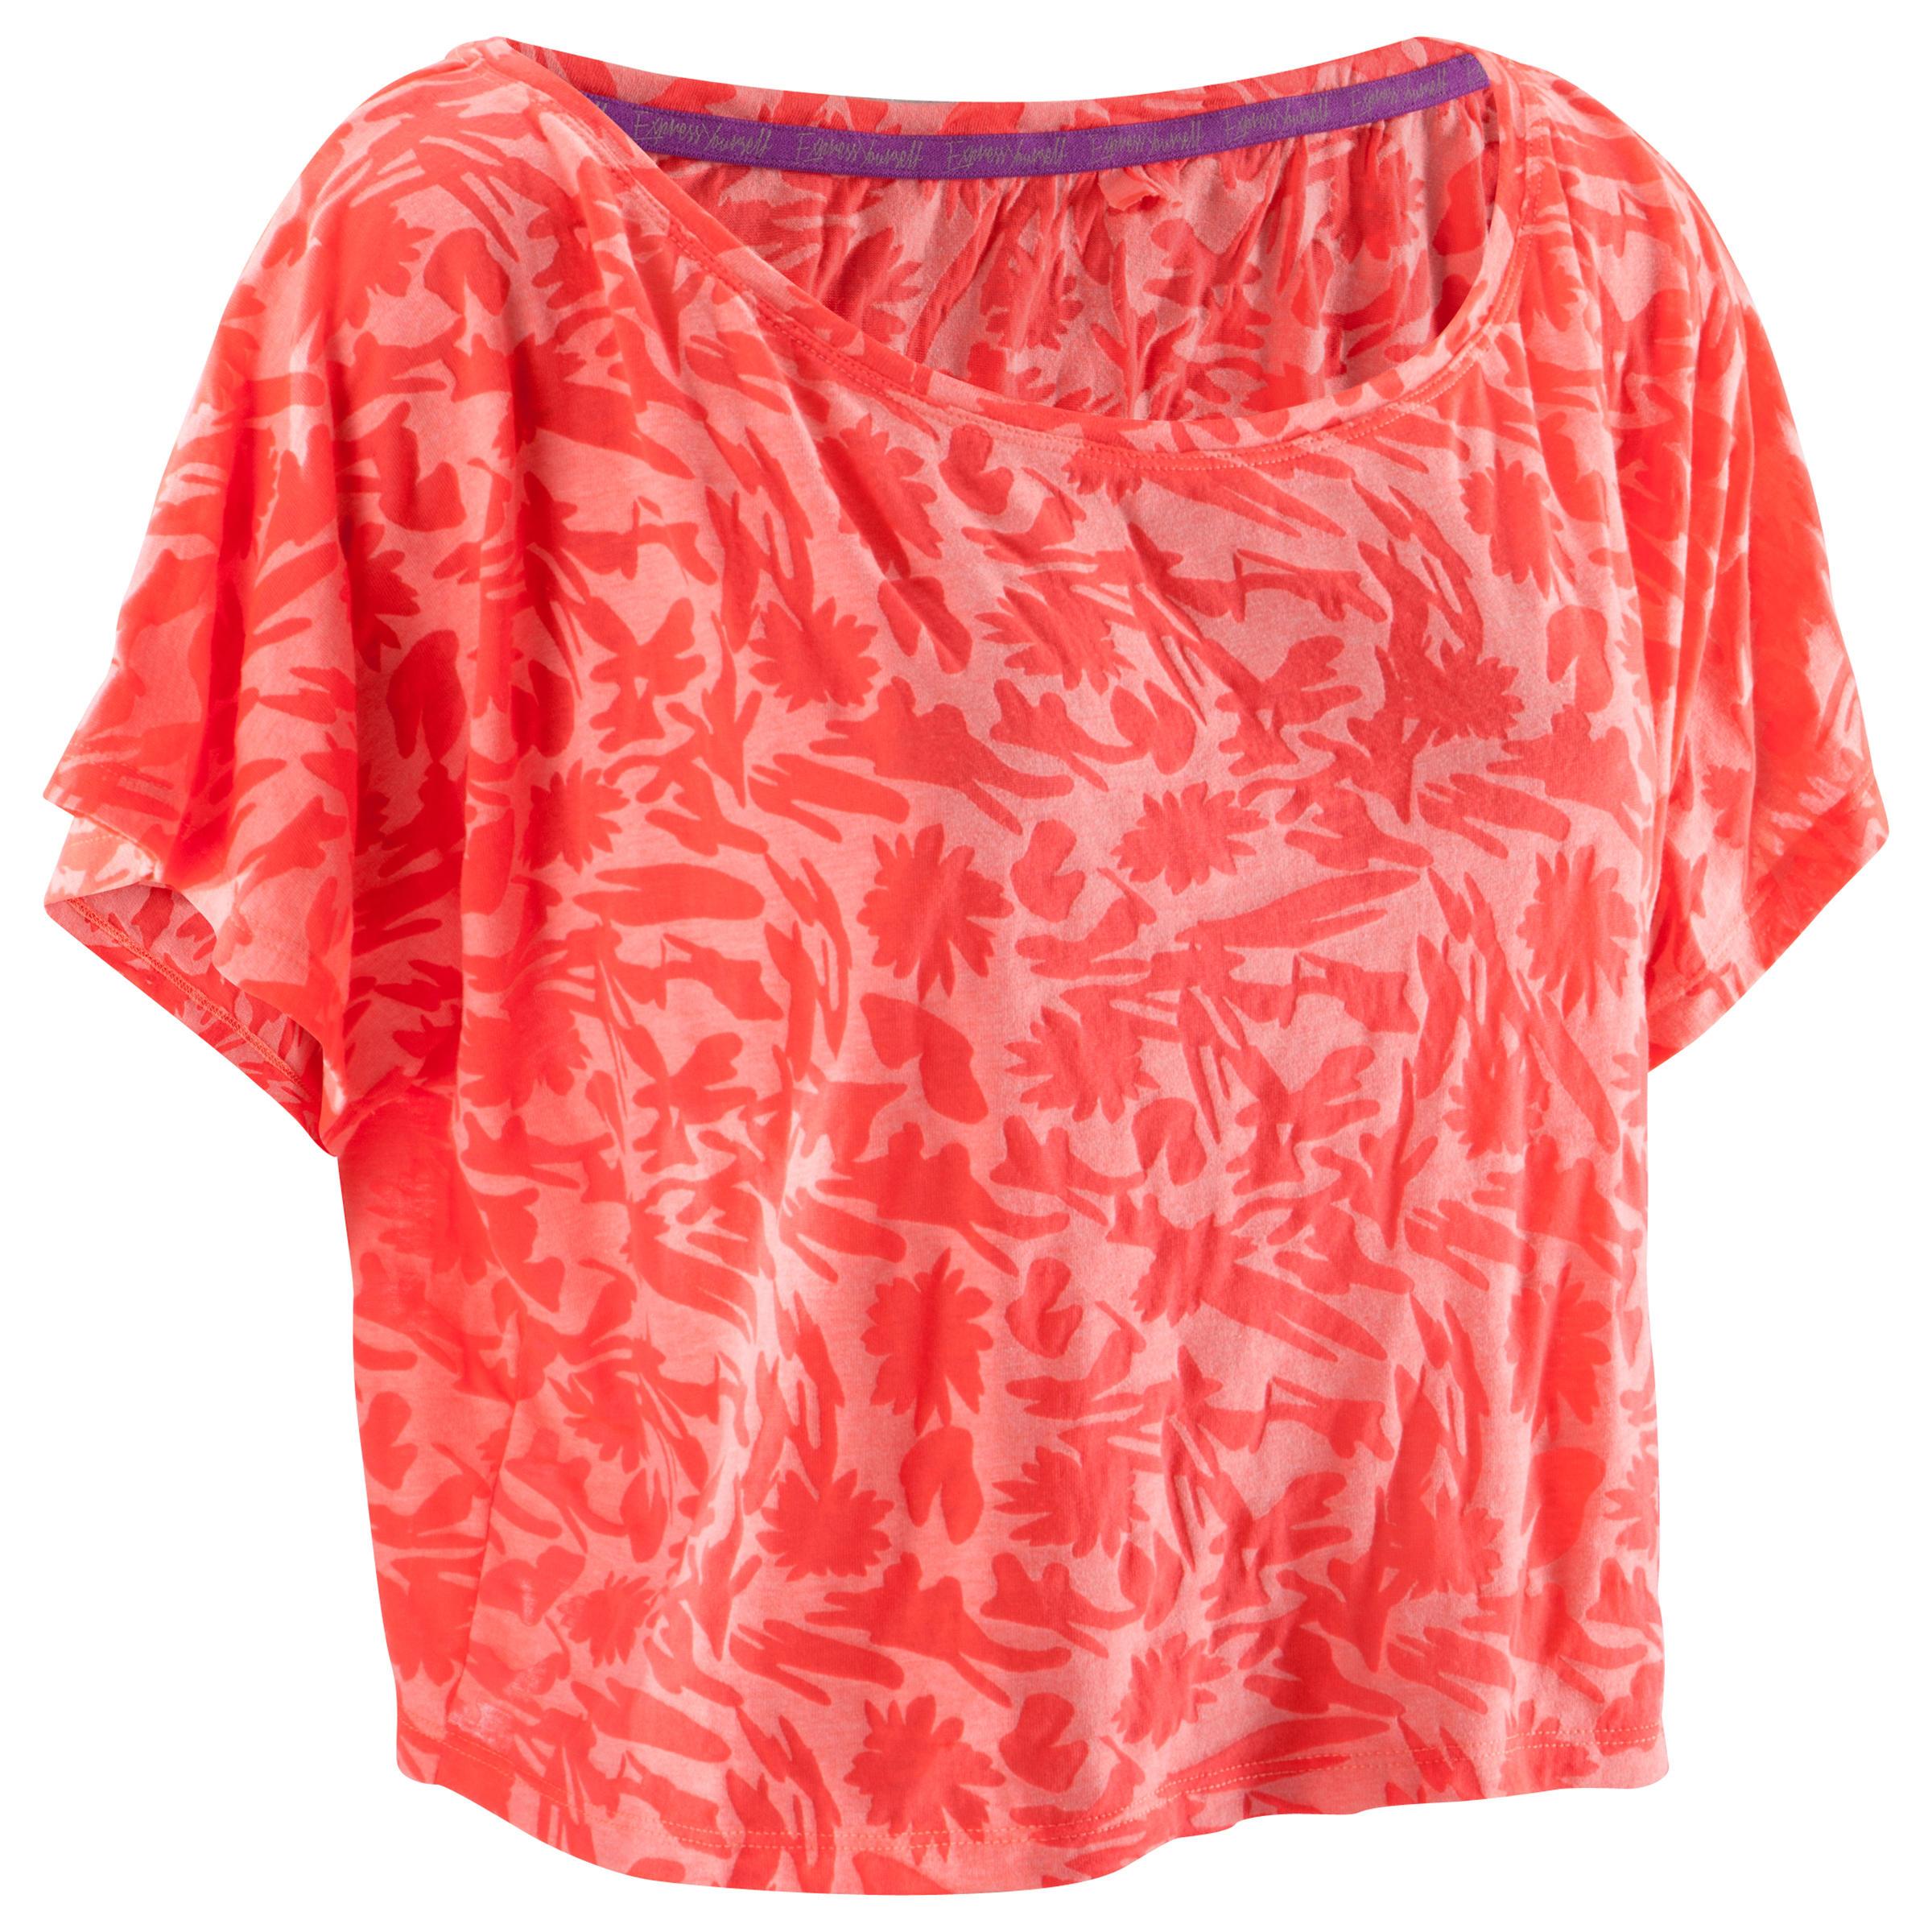 Domyos Kort dans T-shirt dames